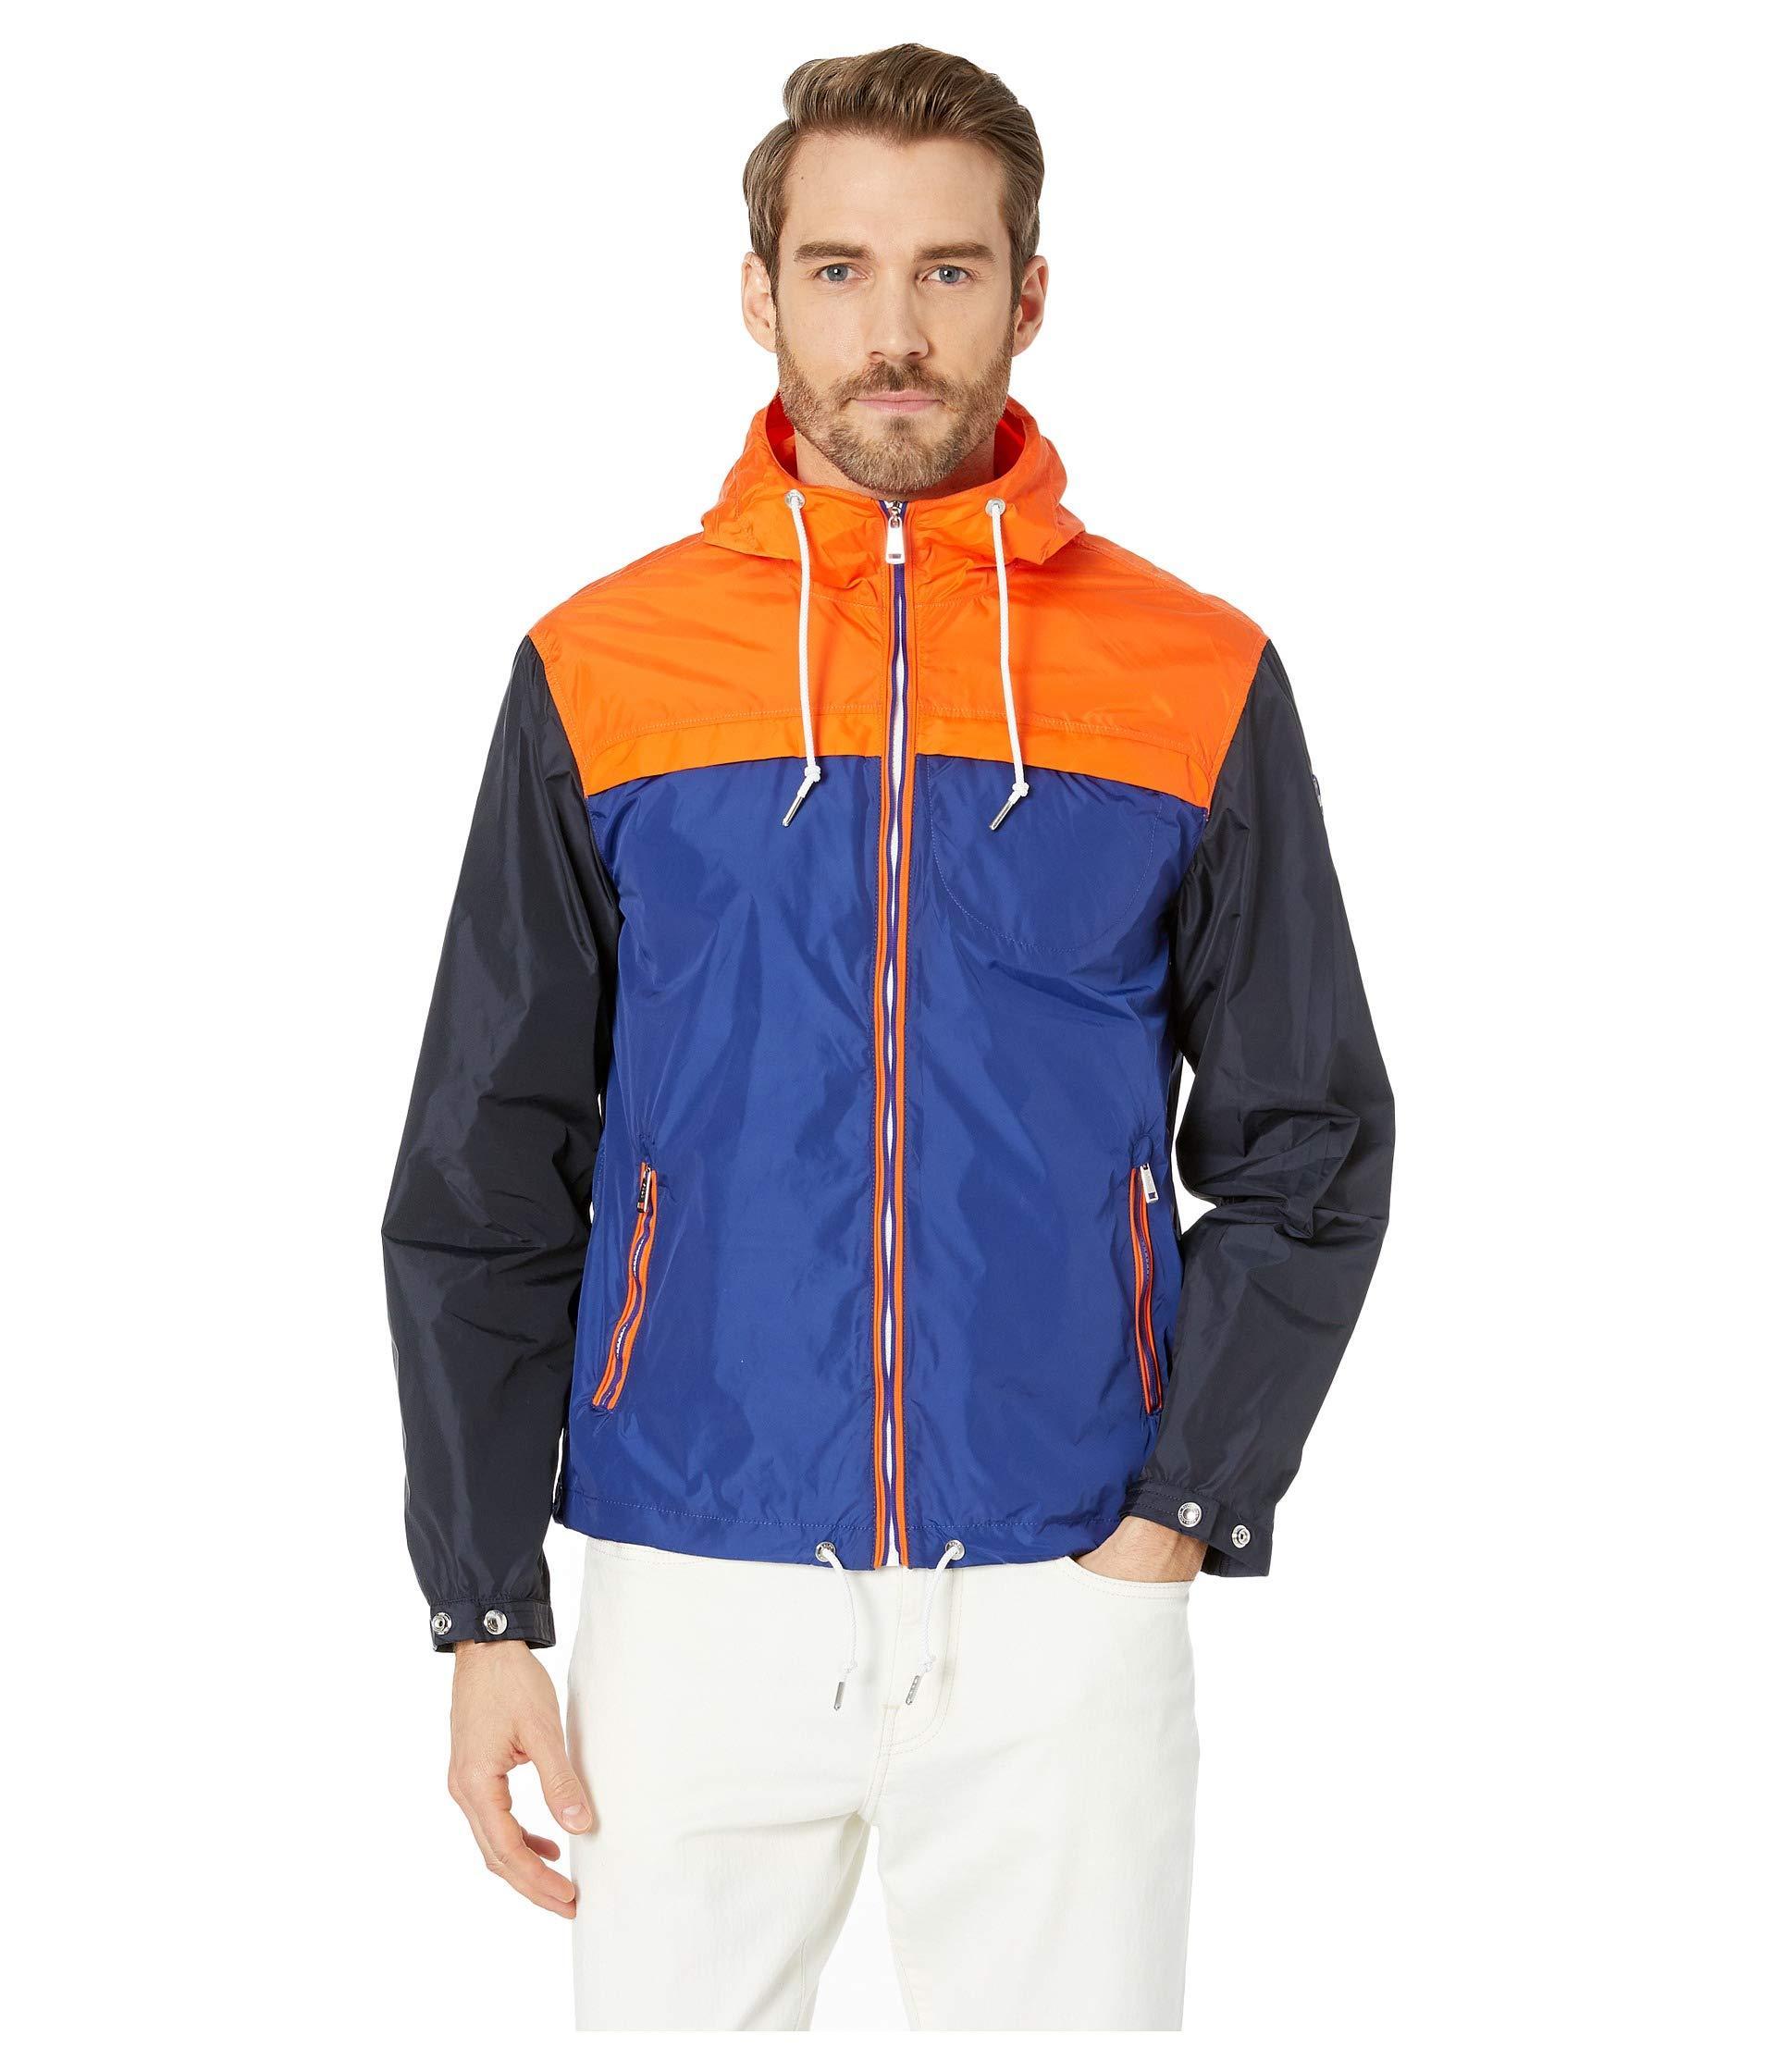 9c861692884a Lyst - Polo Ralph Lauren Anorak Jacket (color Block Multi) Men's ...